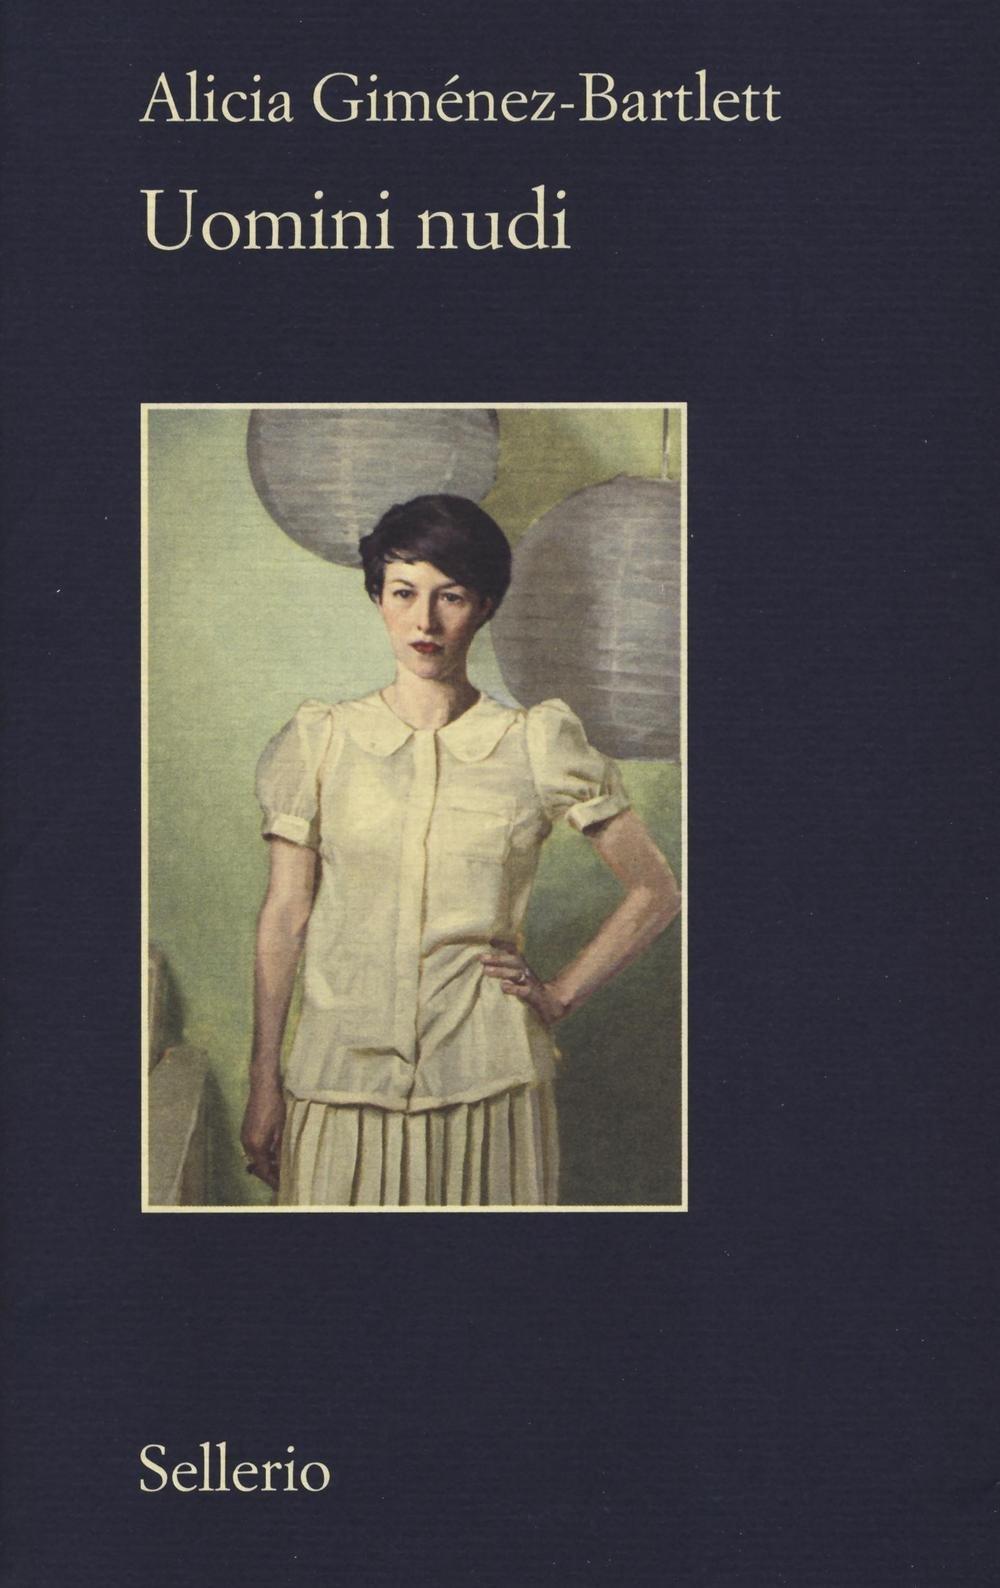 Uomini nudi: Amazon.it: Giménez Bartlett, Alicia, Nicola, Maria: Libri